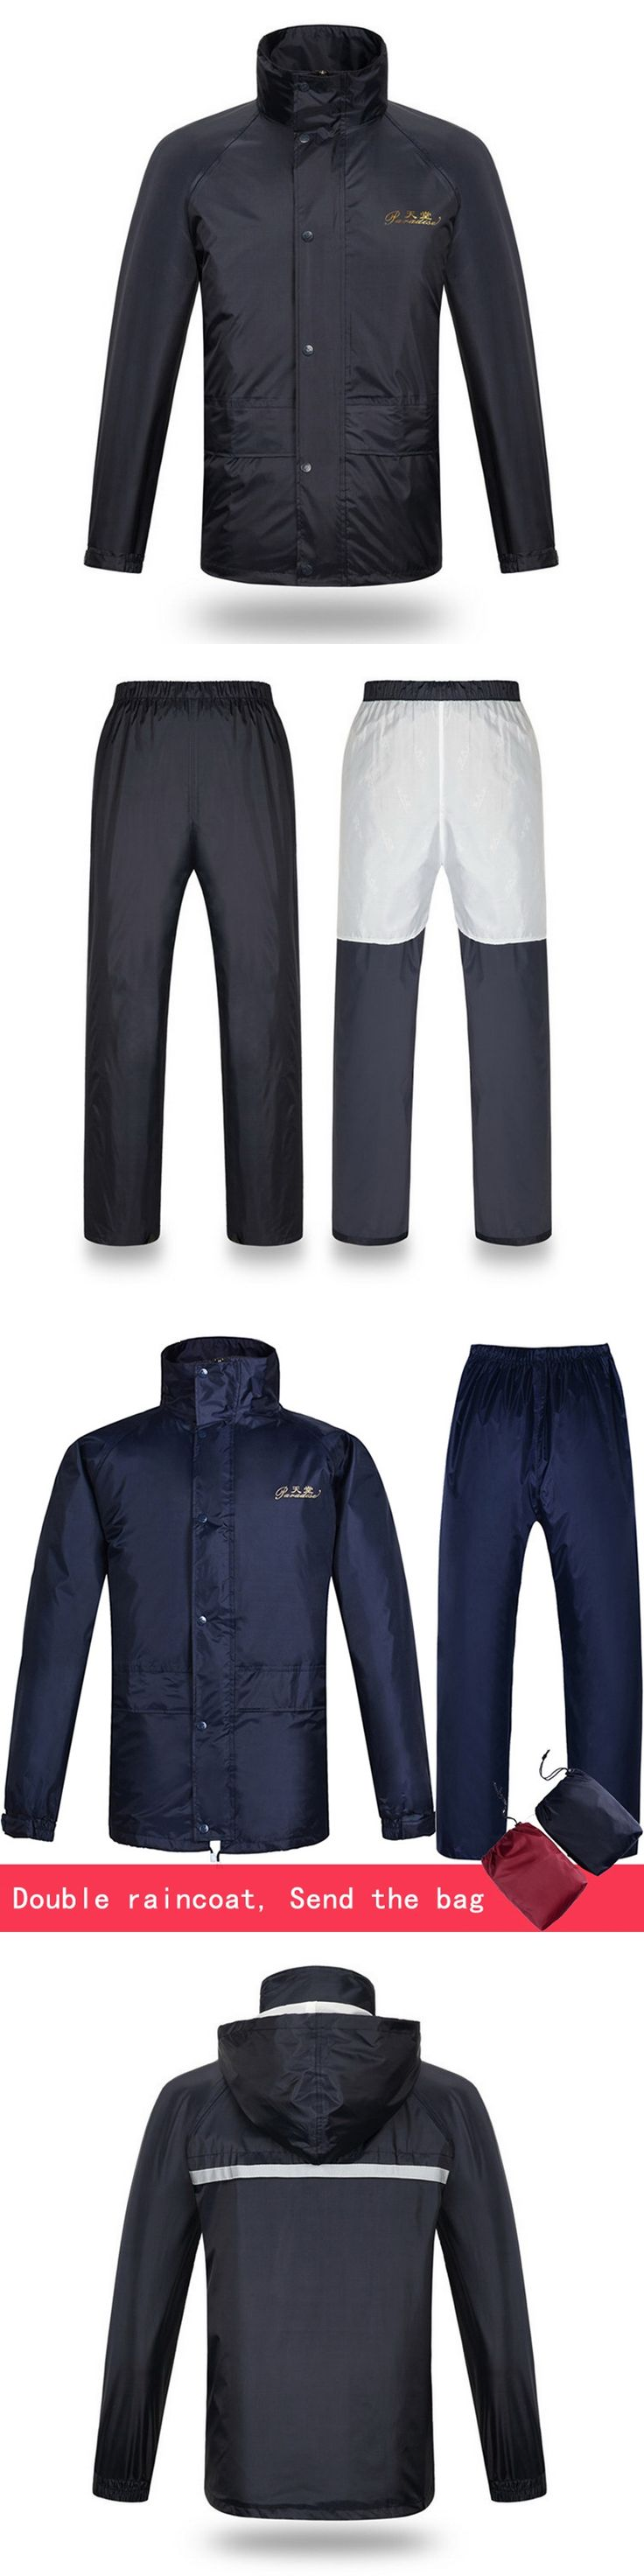 Double layer waterproof jacket+pants Men's suit Windbreaker Single thicken Jackets loose raincoat outfits 1.4kg